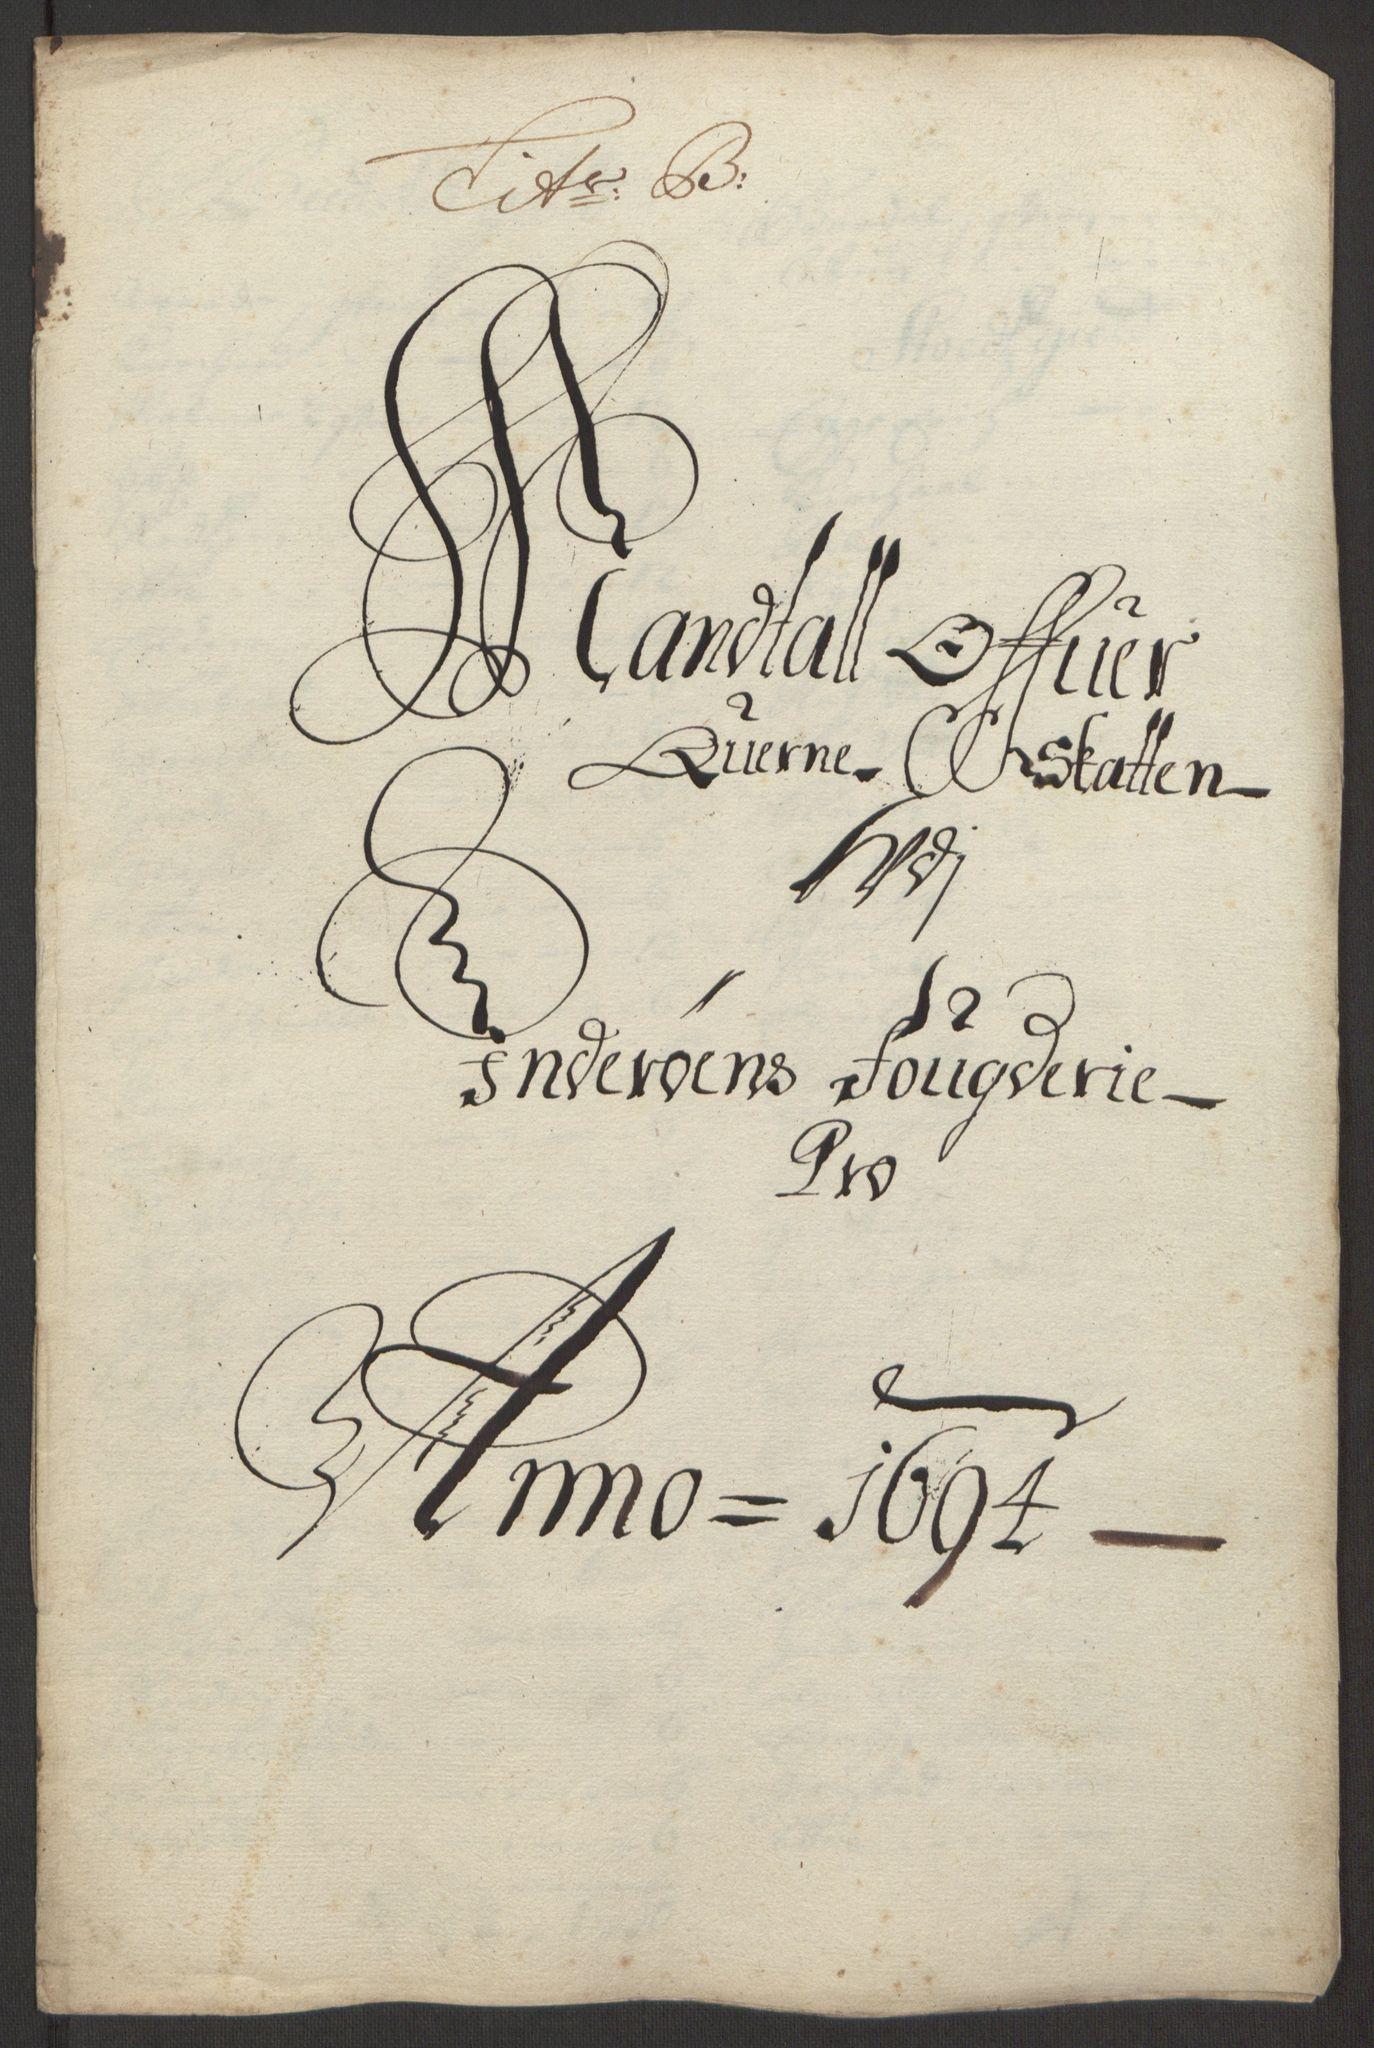 RA, Rentekammeret inntil 1814, Reviderte regnskaper, Fogderegnskap, R63/L4308: Fogderegnskap Inderøy, 1692-1694, s. 533